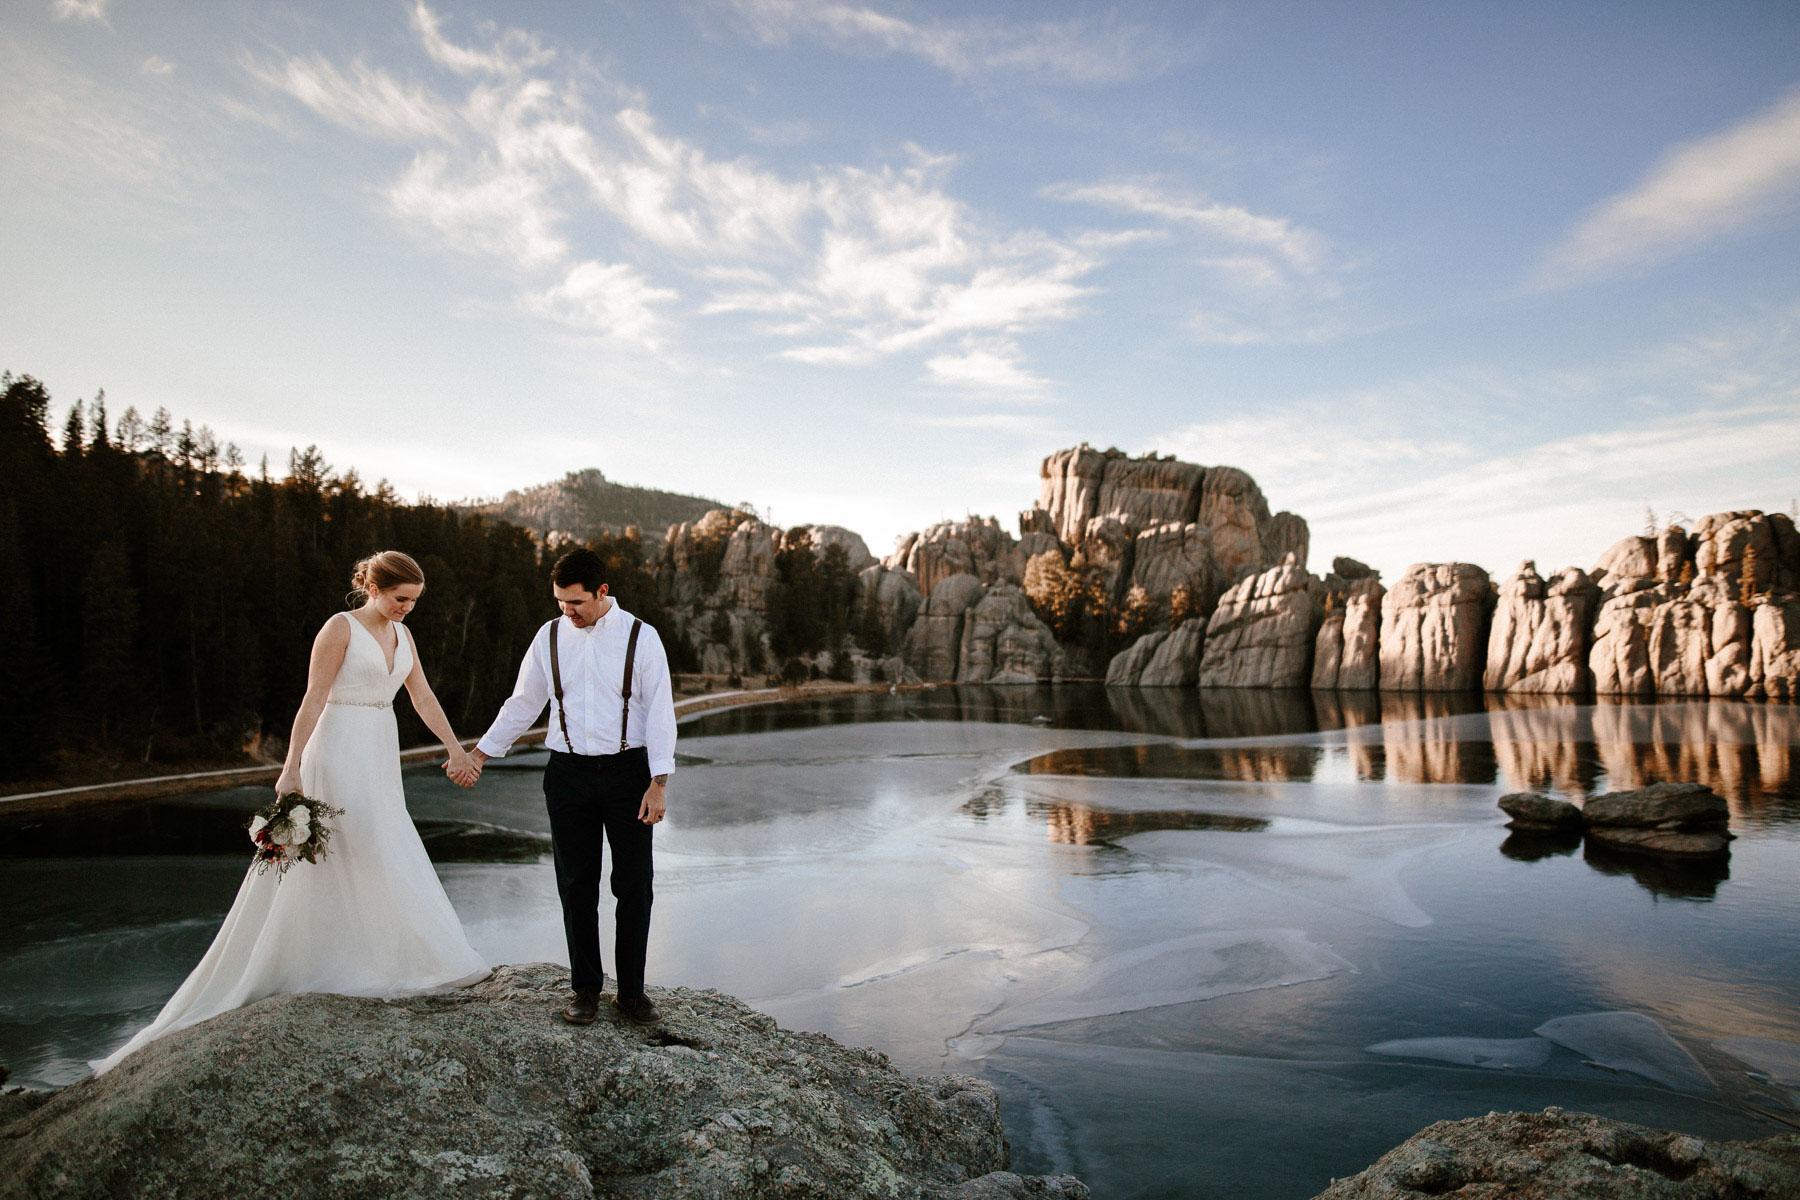 sioux-falls-black-hills-rapid-city-elopement-wedding-adventure-photographer-custer-sylvan-lake-30.jpg